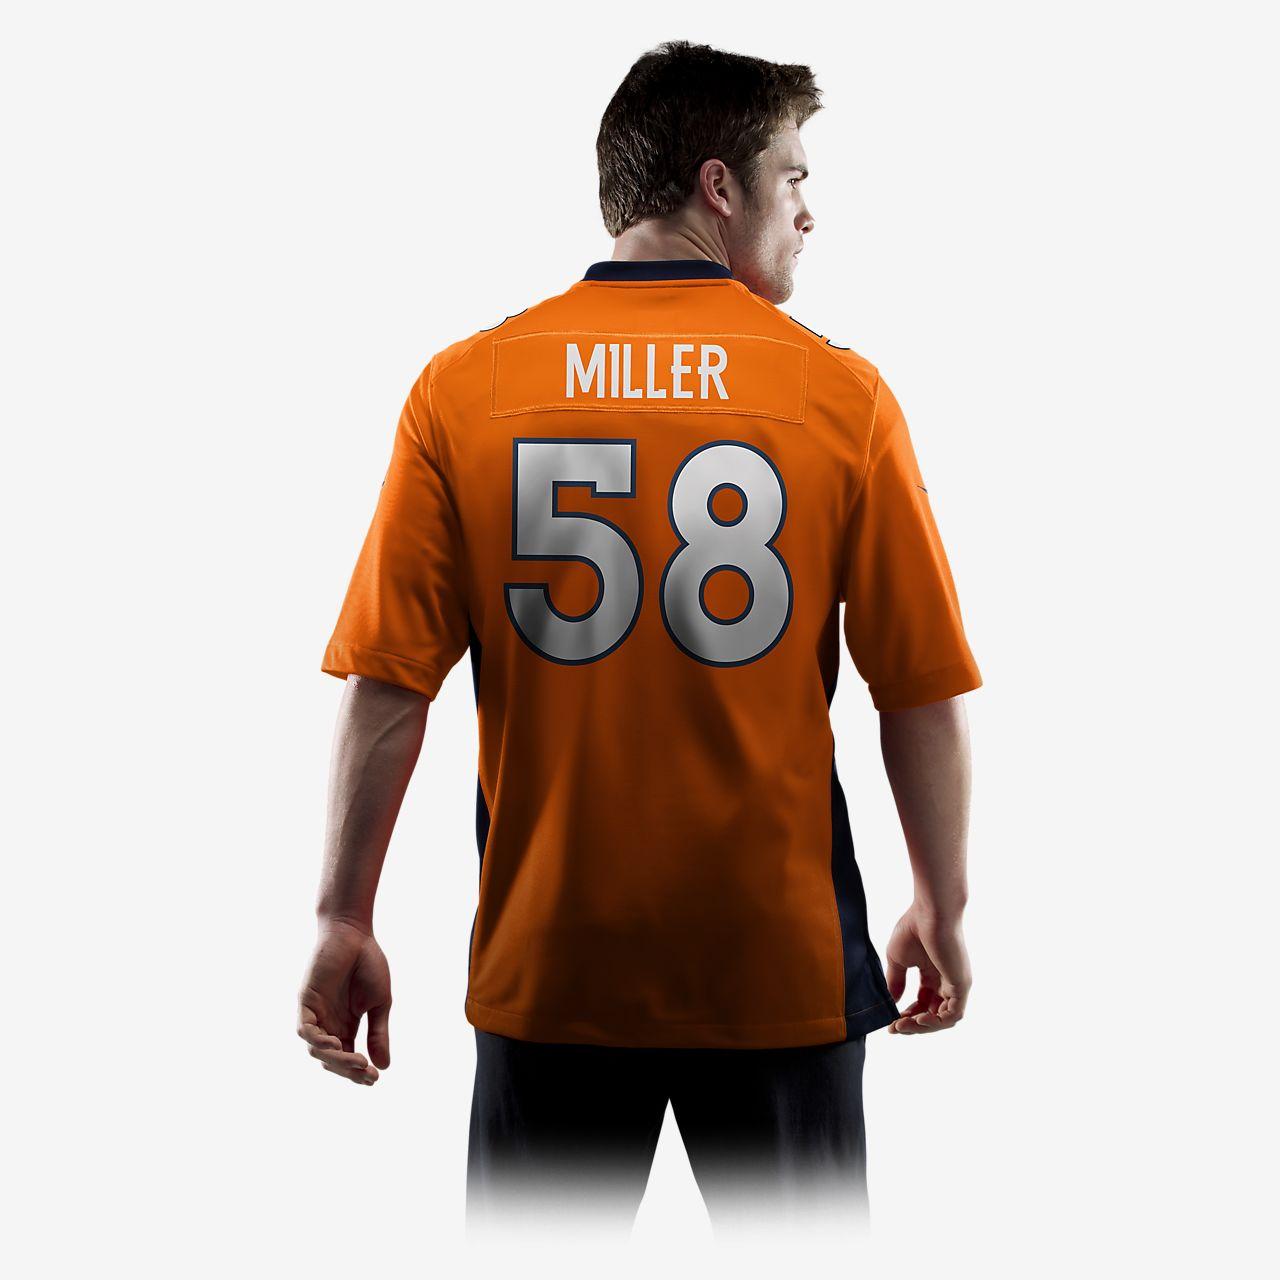 c0e018de8 NFL Denver Broncos (Von Miller) Men s Football Home Game Jersey ...